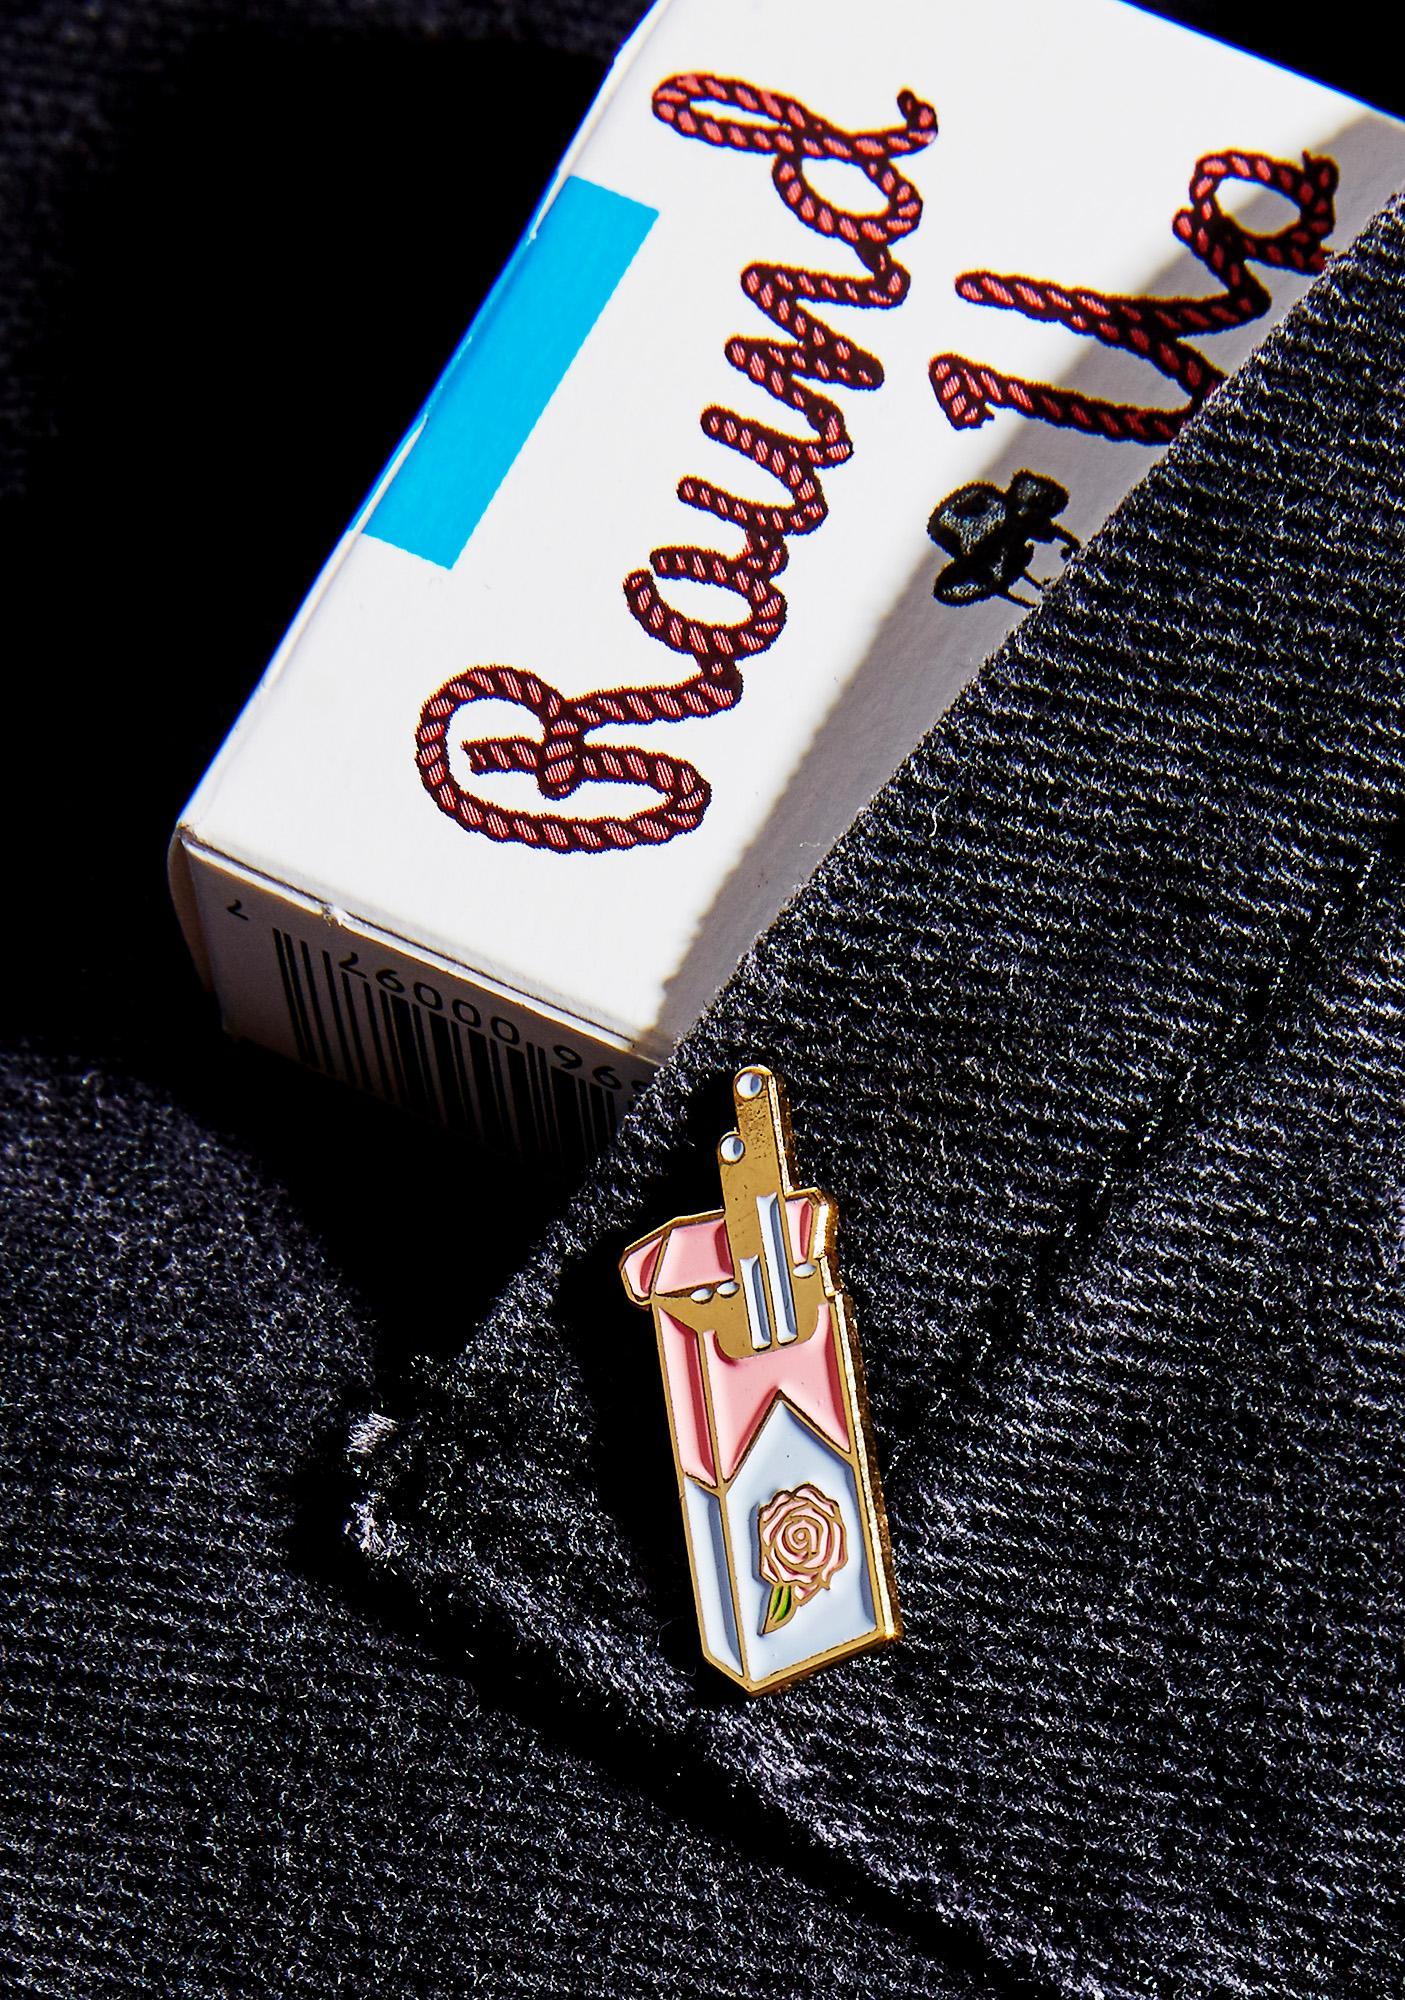 Rosehound Apparel Cigarettes Enamel Pin